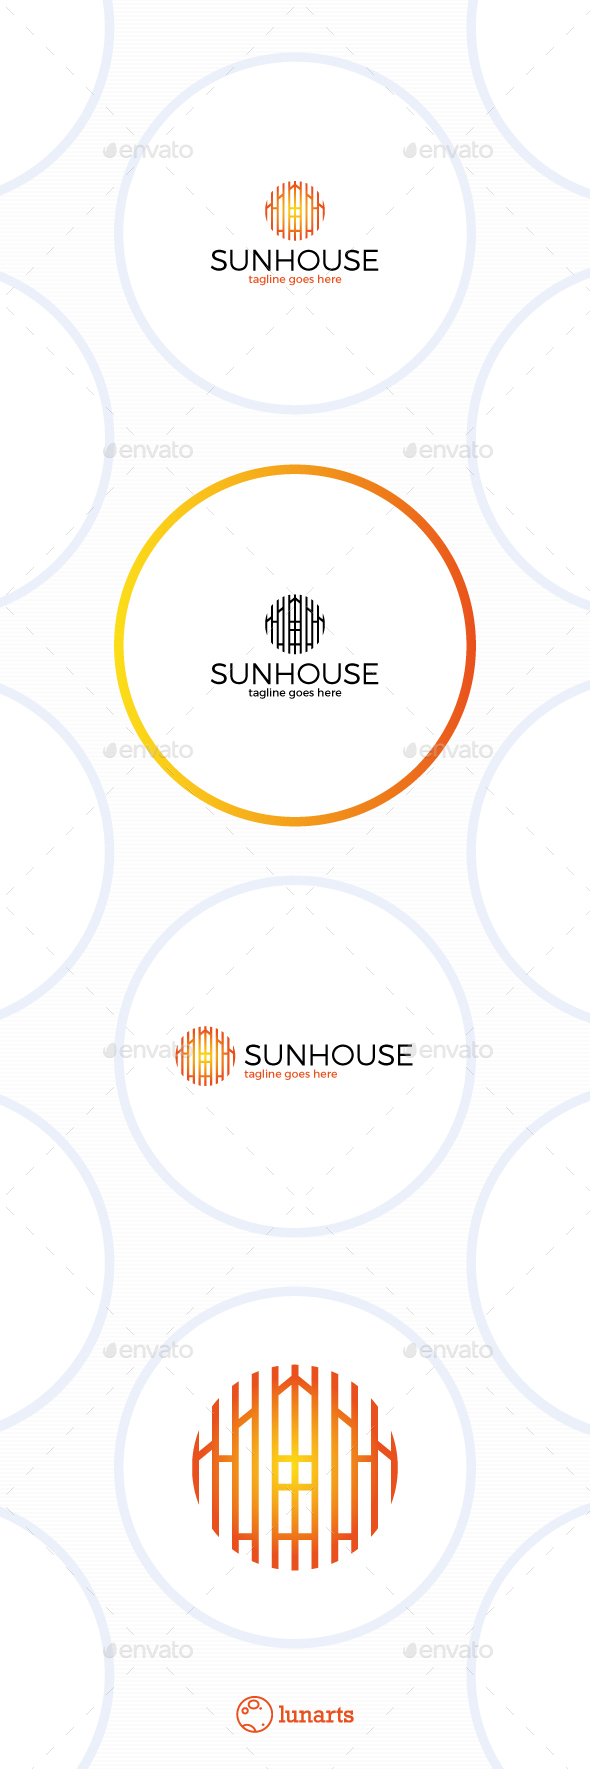 Sun House Logo - Line Circle